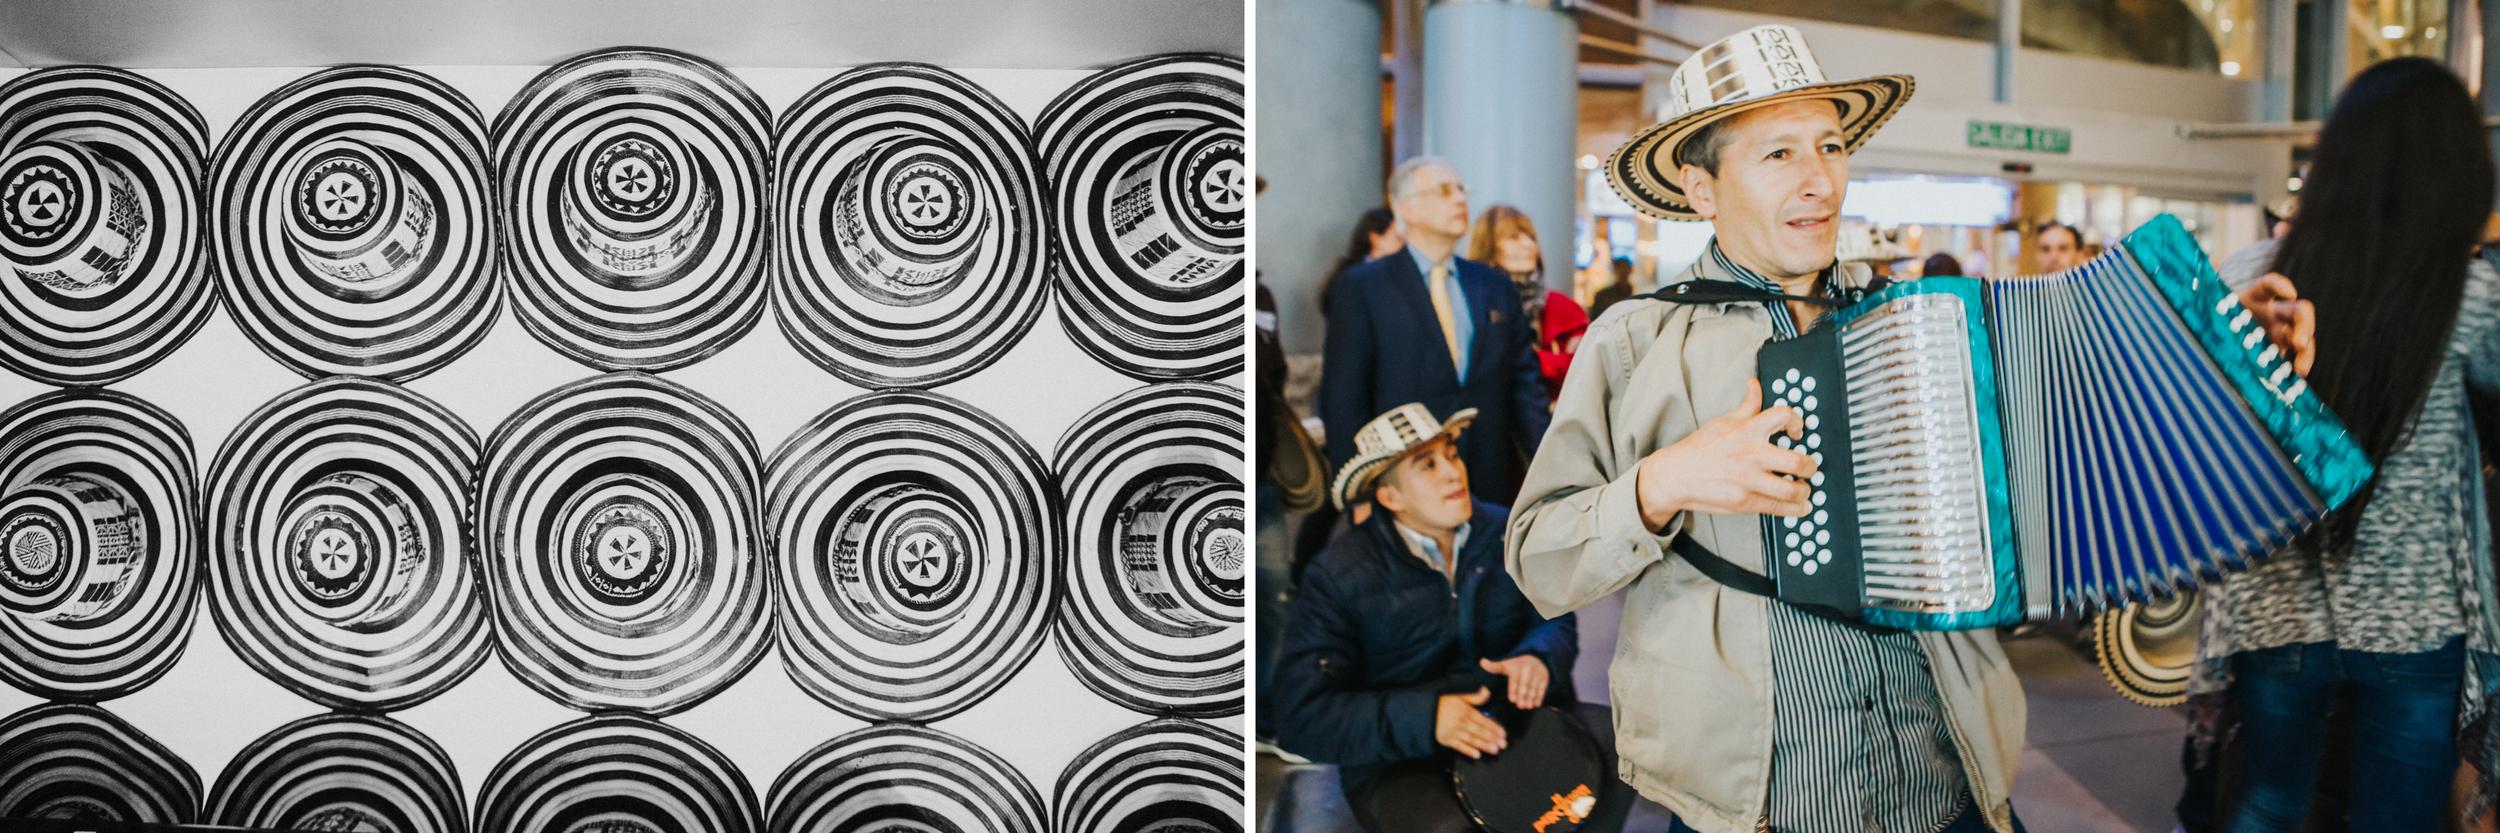 Bogota-destination-wedding-photographer-music-traditional-straw-hats-accordian.jpg